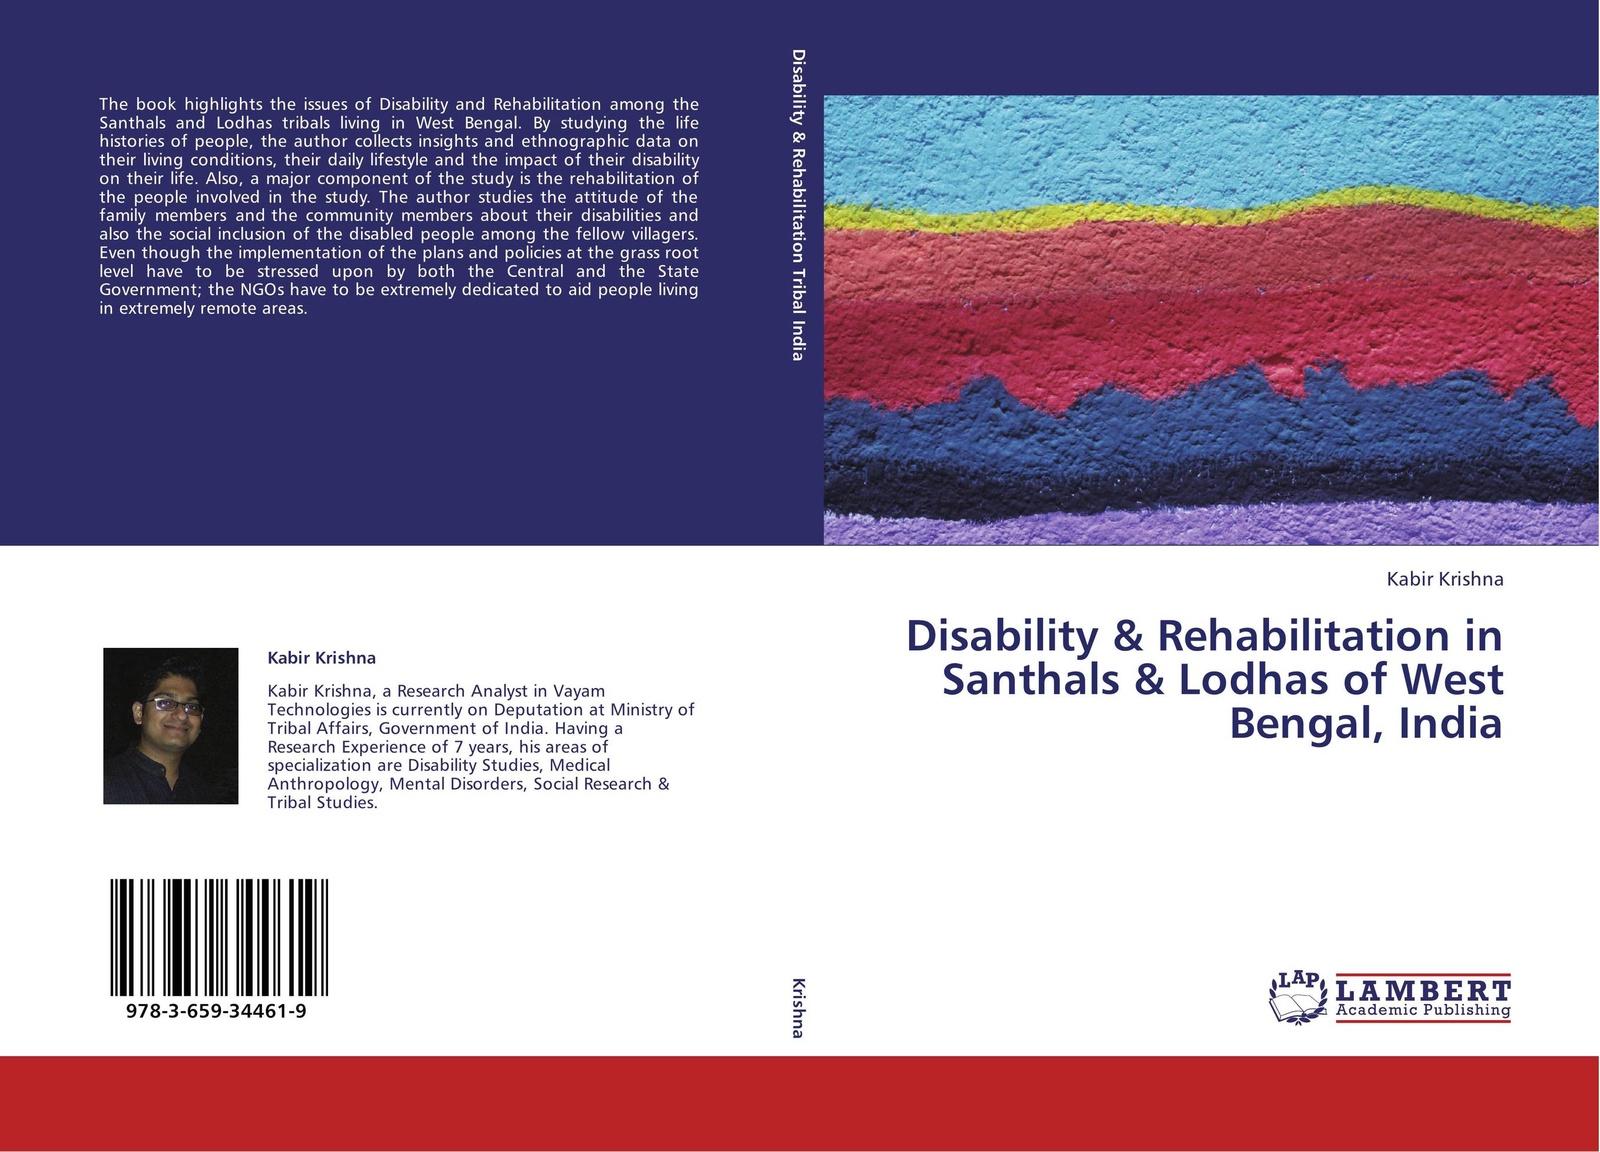 цены Kabir Krishna Disability & Rehabilitation in Santhals & Lodhas of West Bengal, India